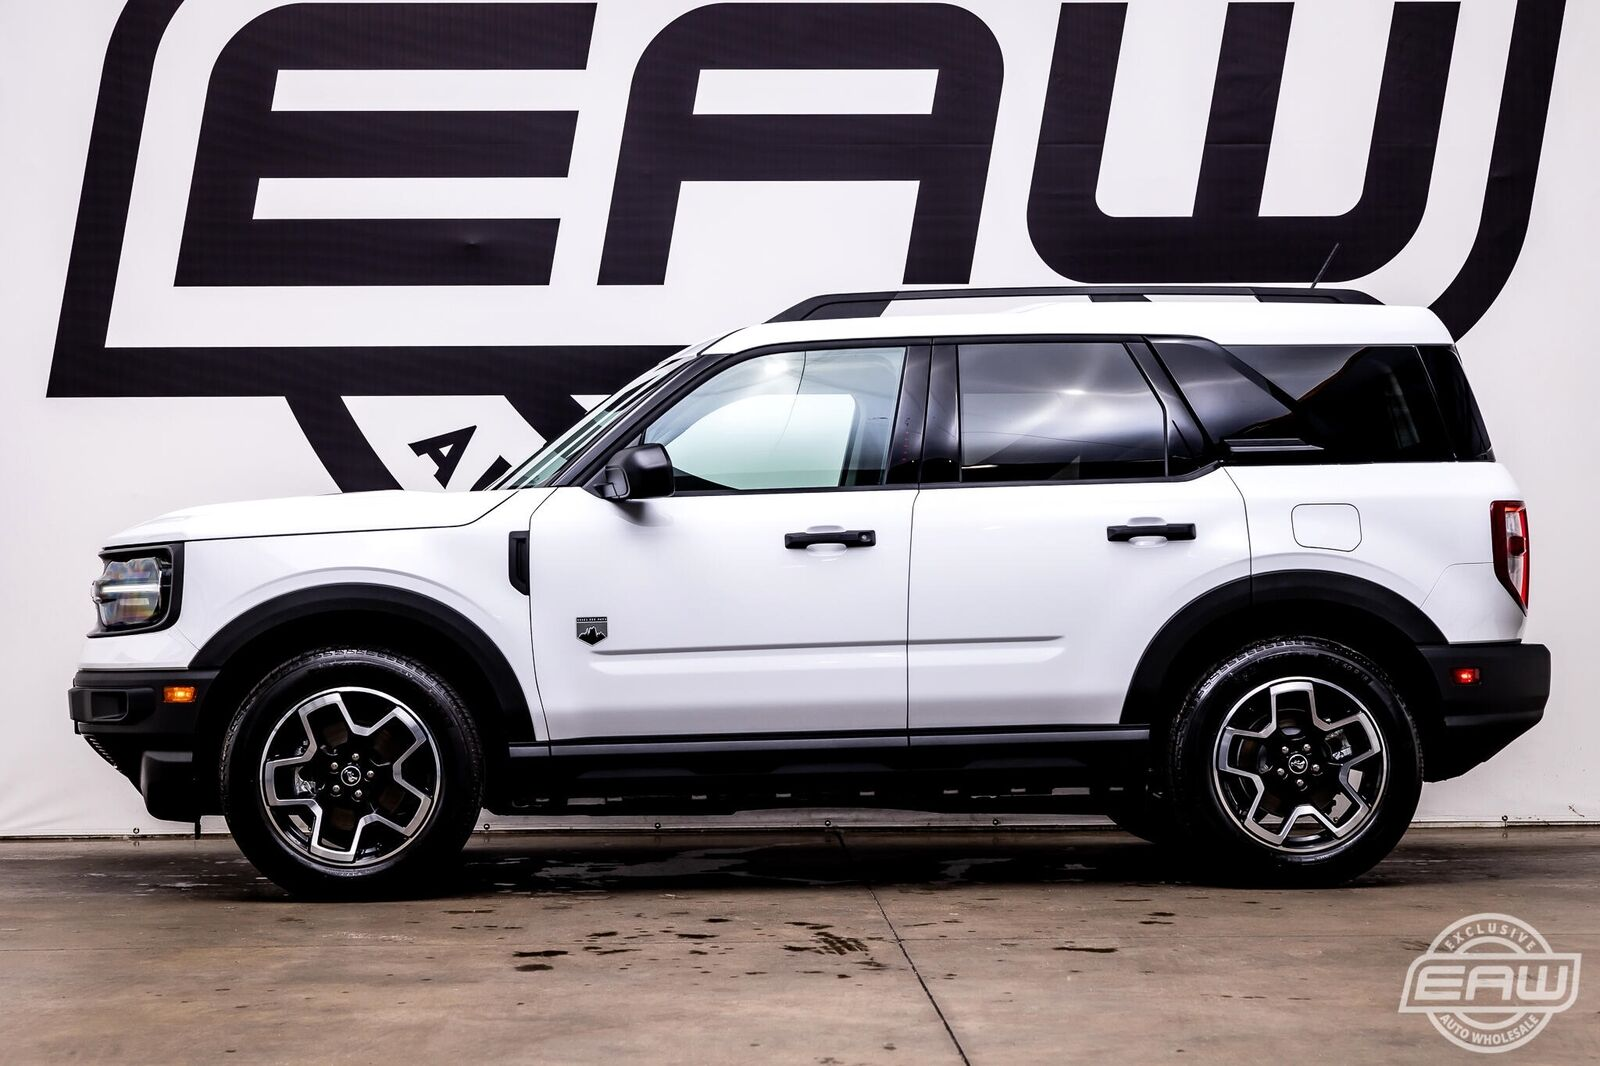 2021 Ford Bronco Sport Big Bend 4x4 167 Miles White Utility Body 3 Cylinder Engi